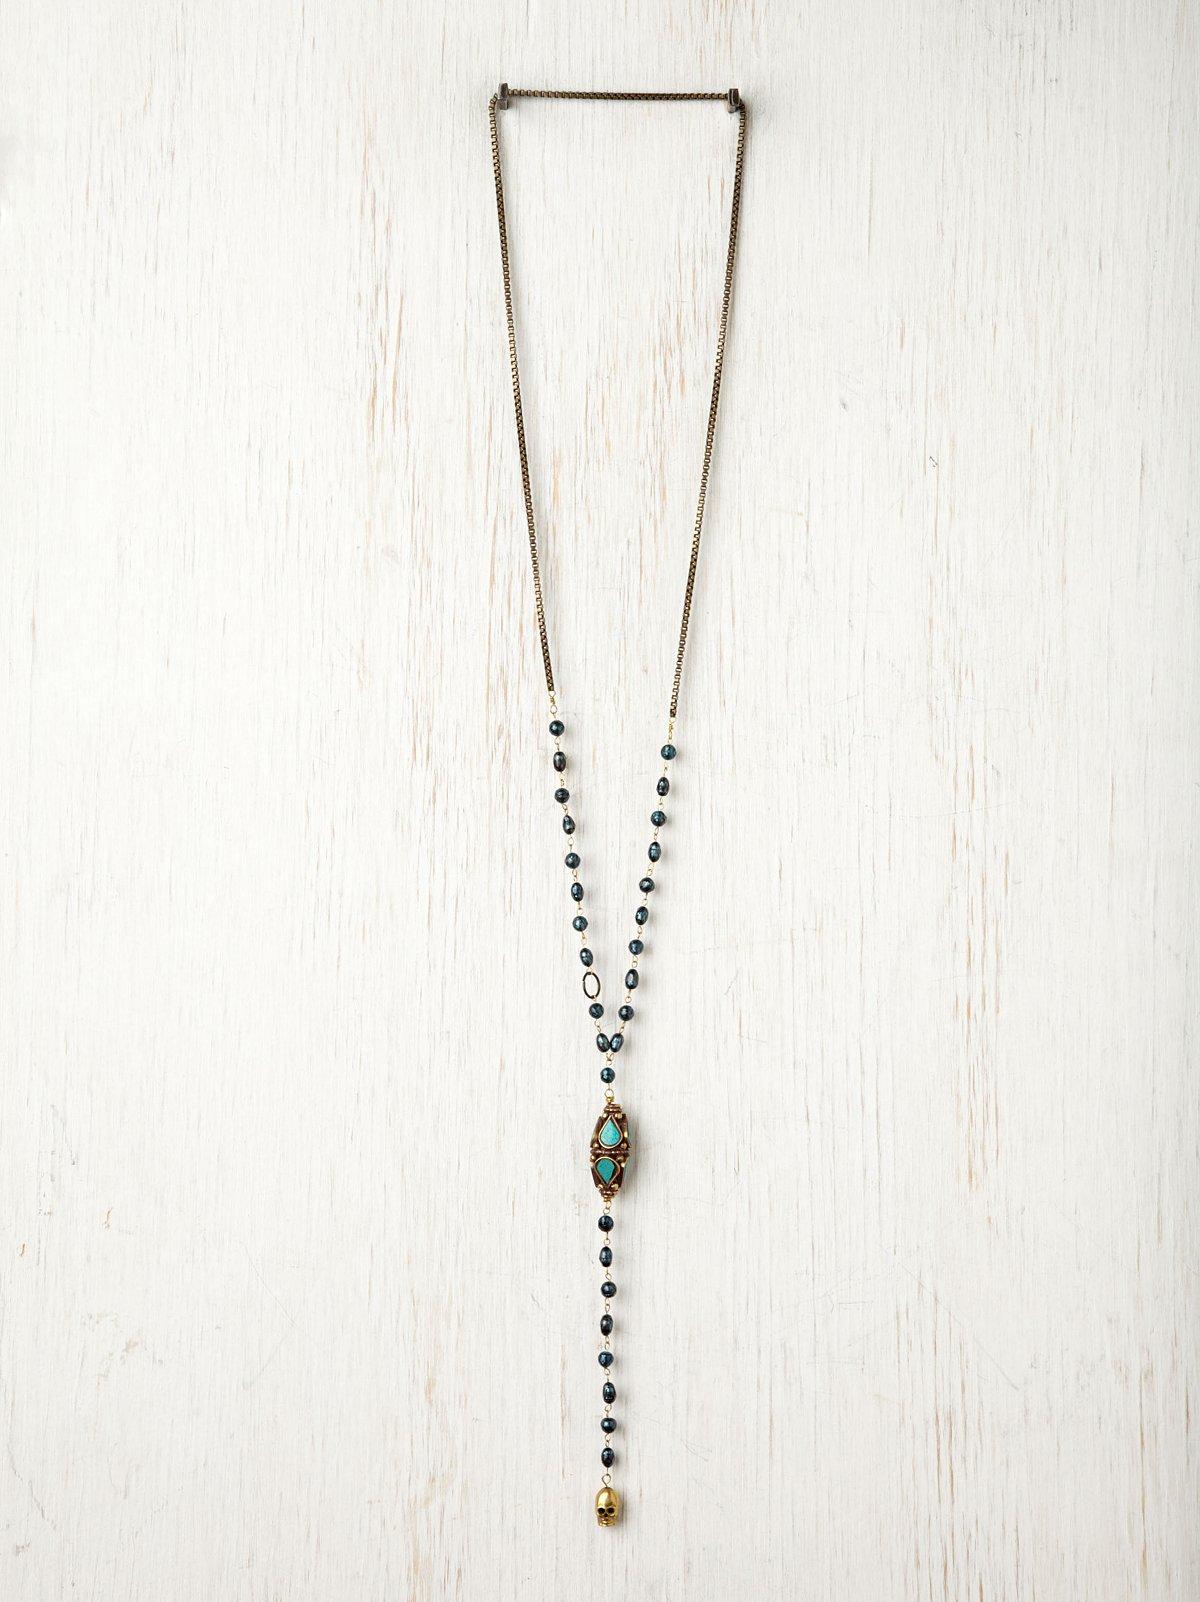 Dusk to Dawn Little Rosary Pendant